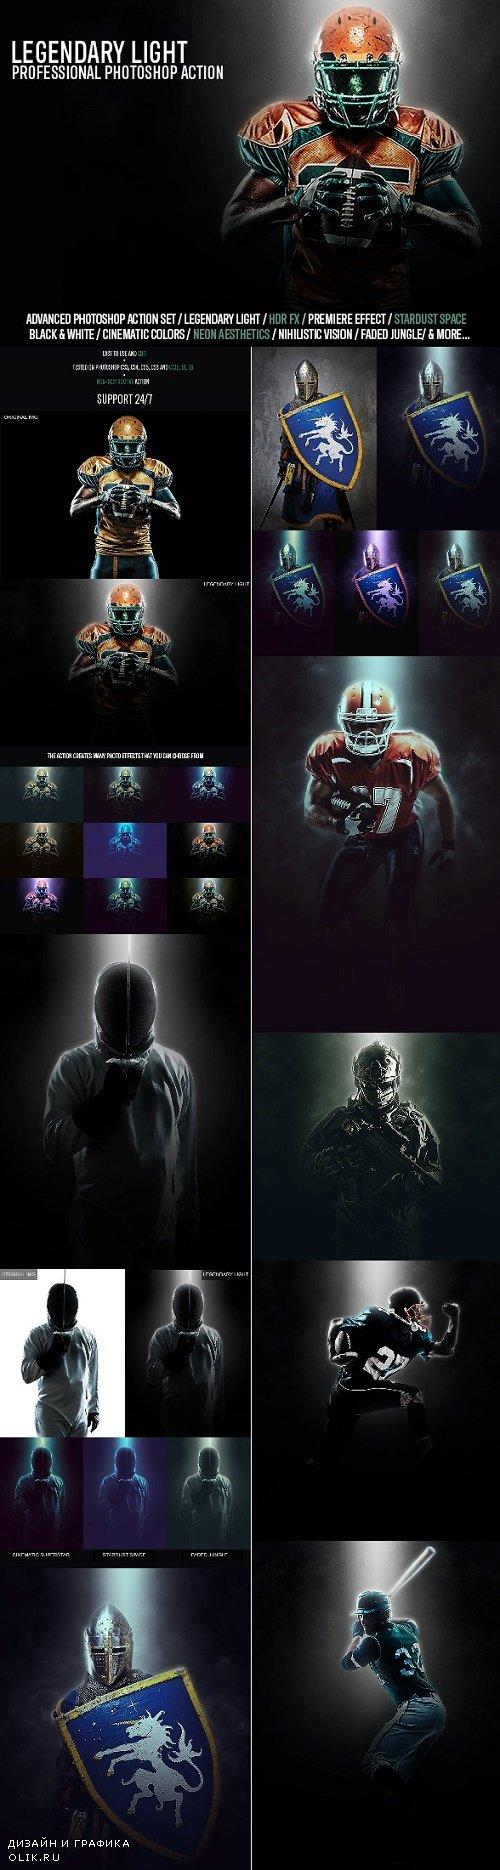 Legendary Light Photoshop Action 24577773